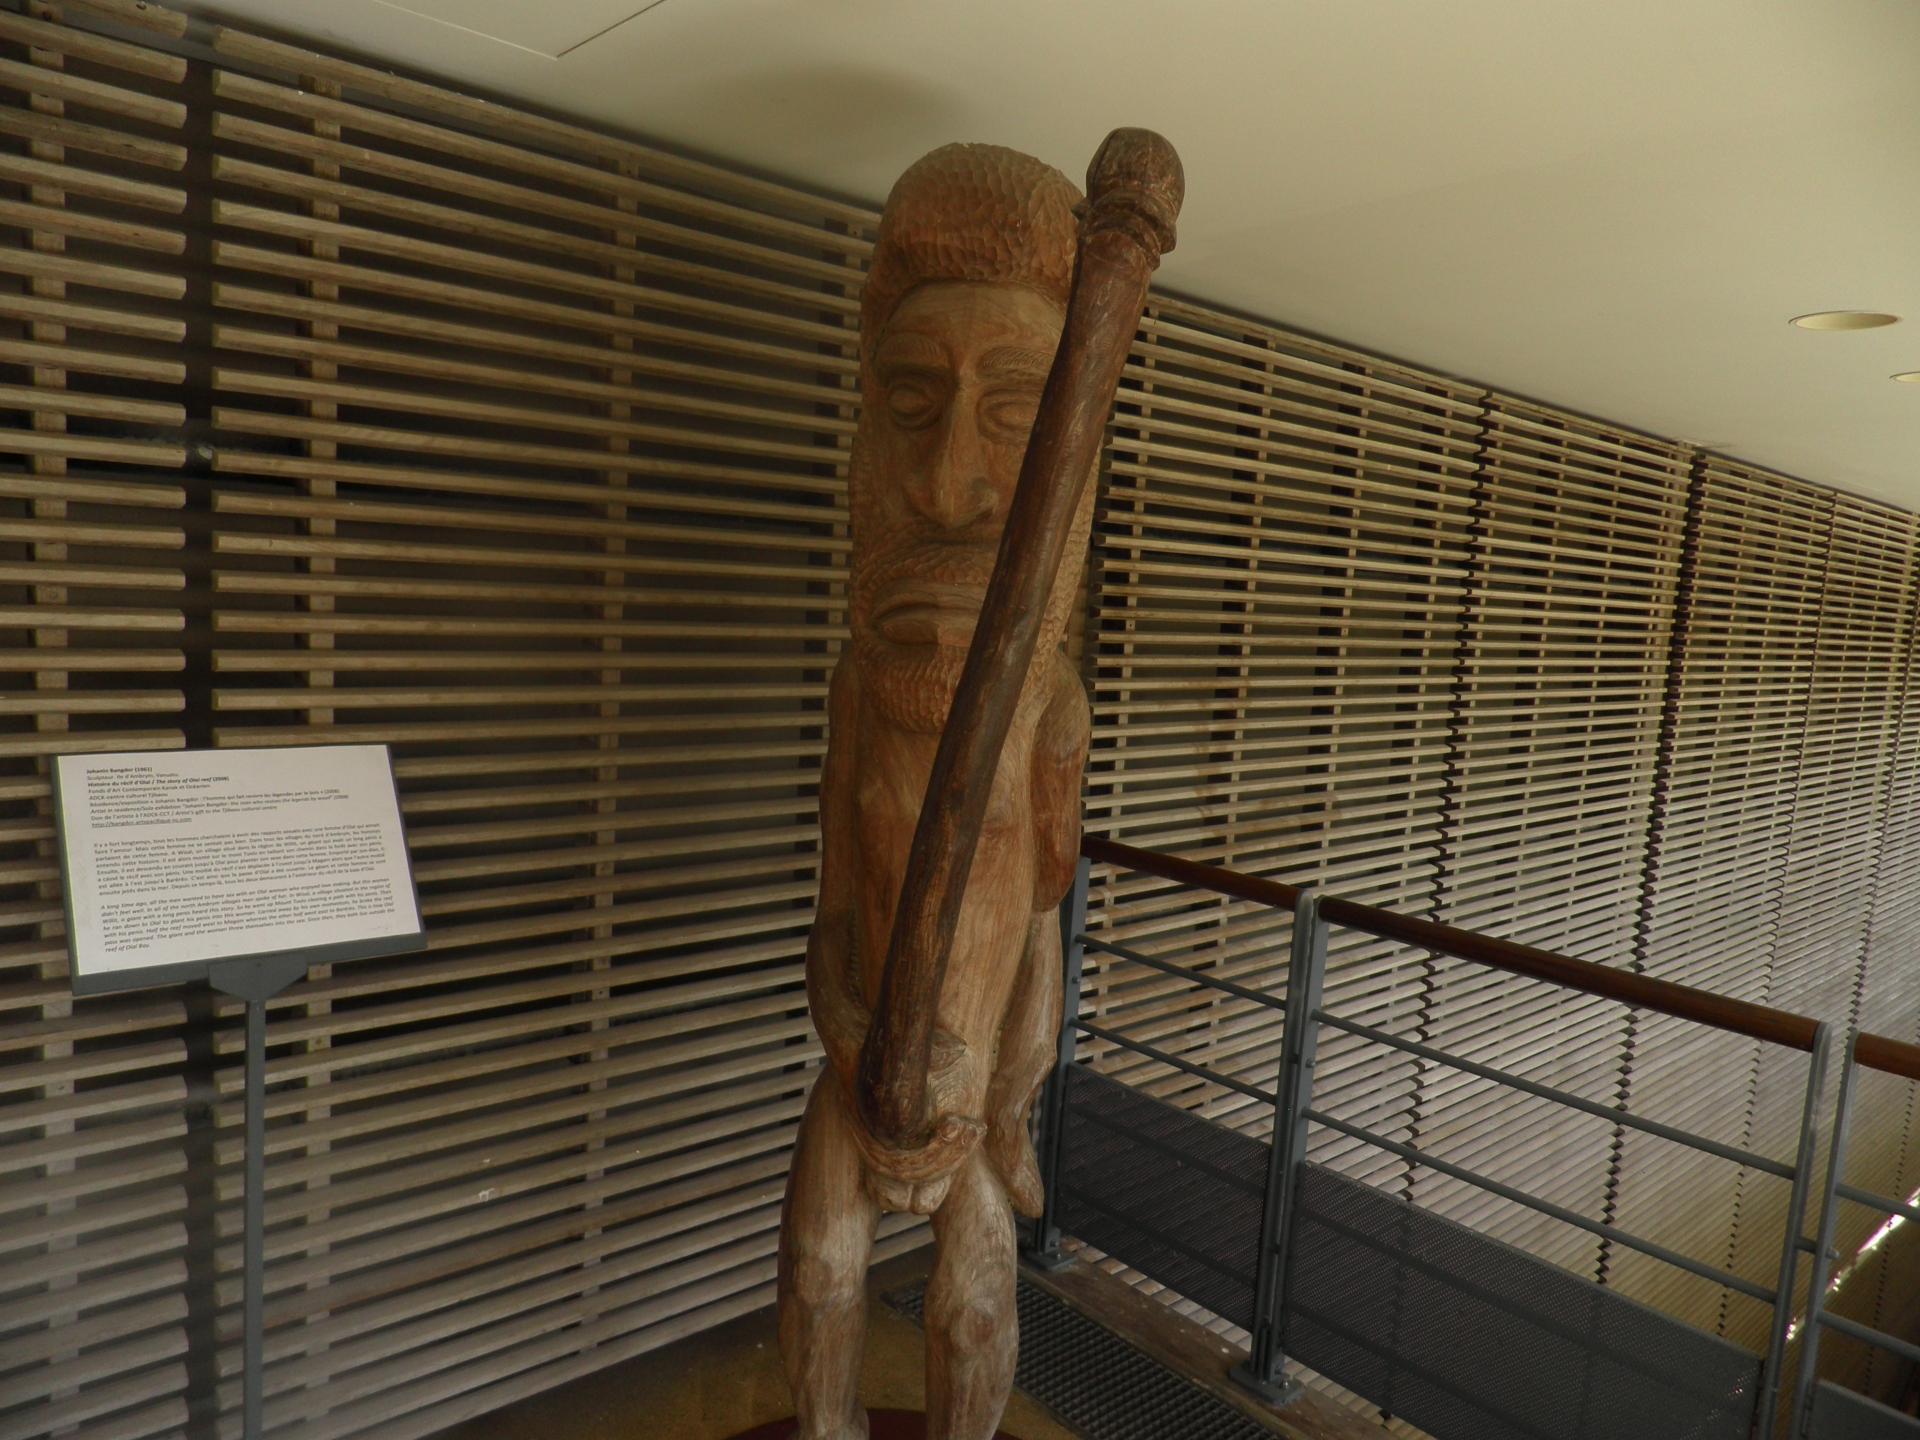 Kanak, Centre culturel Jean-Marie Tjibaou-Photo Fabienne